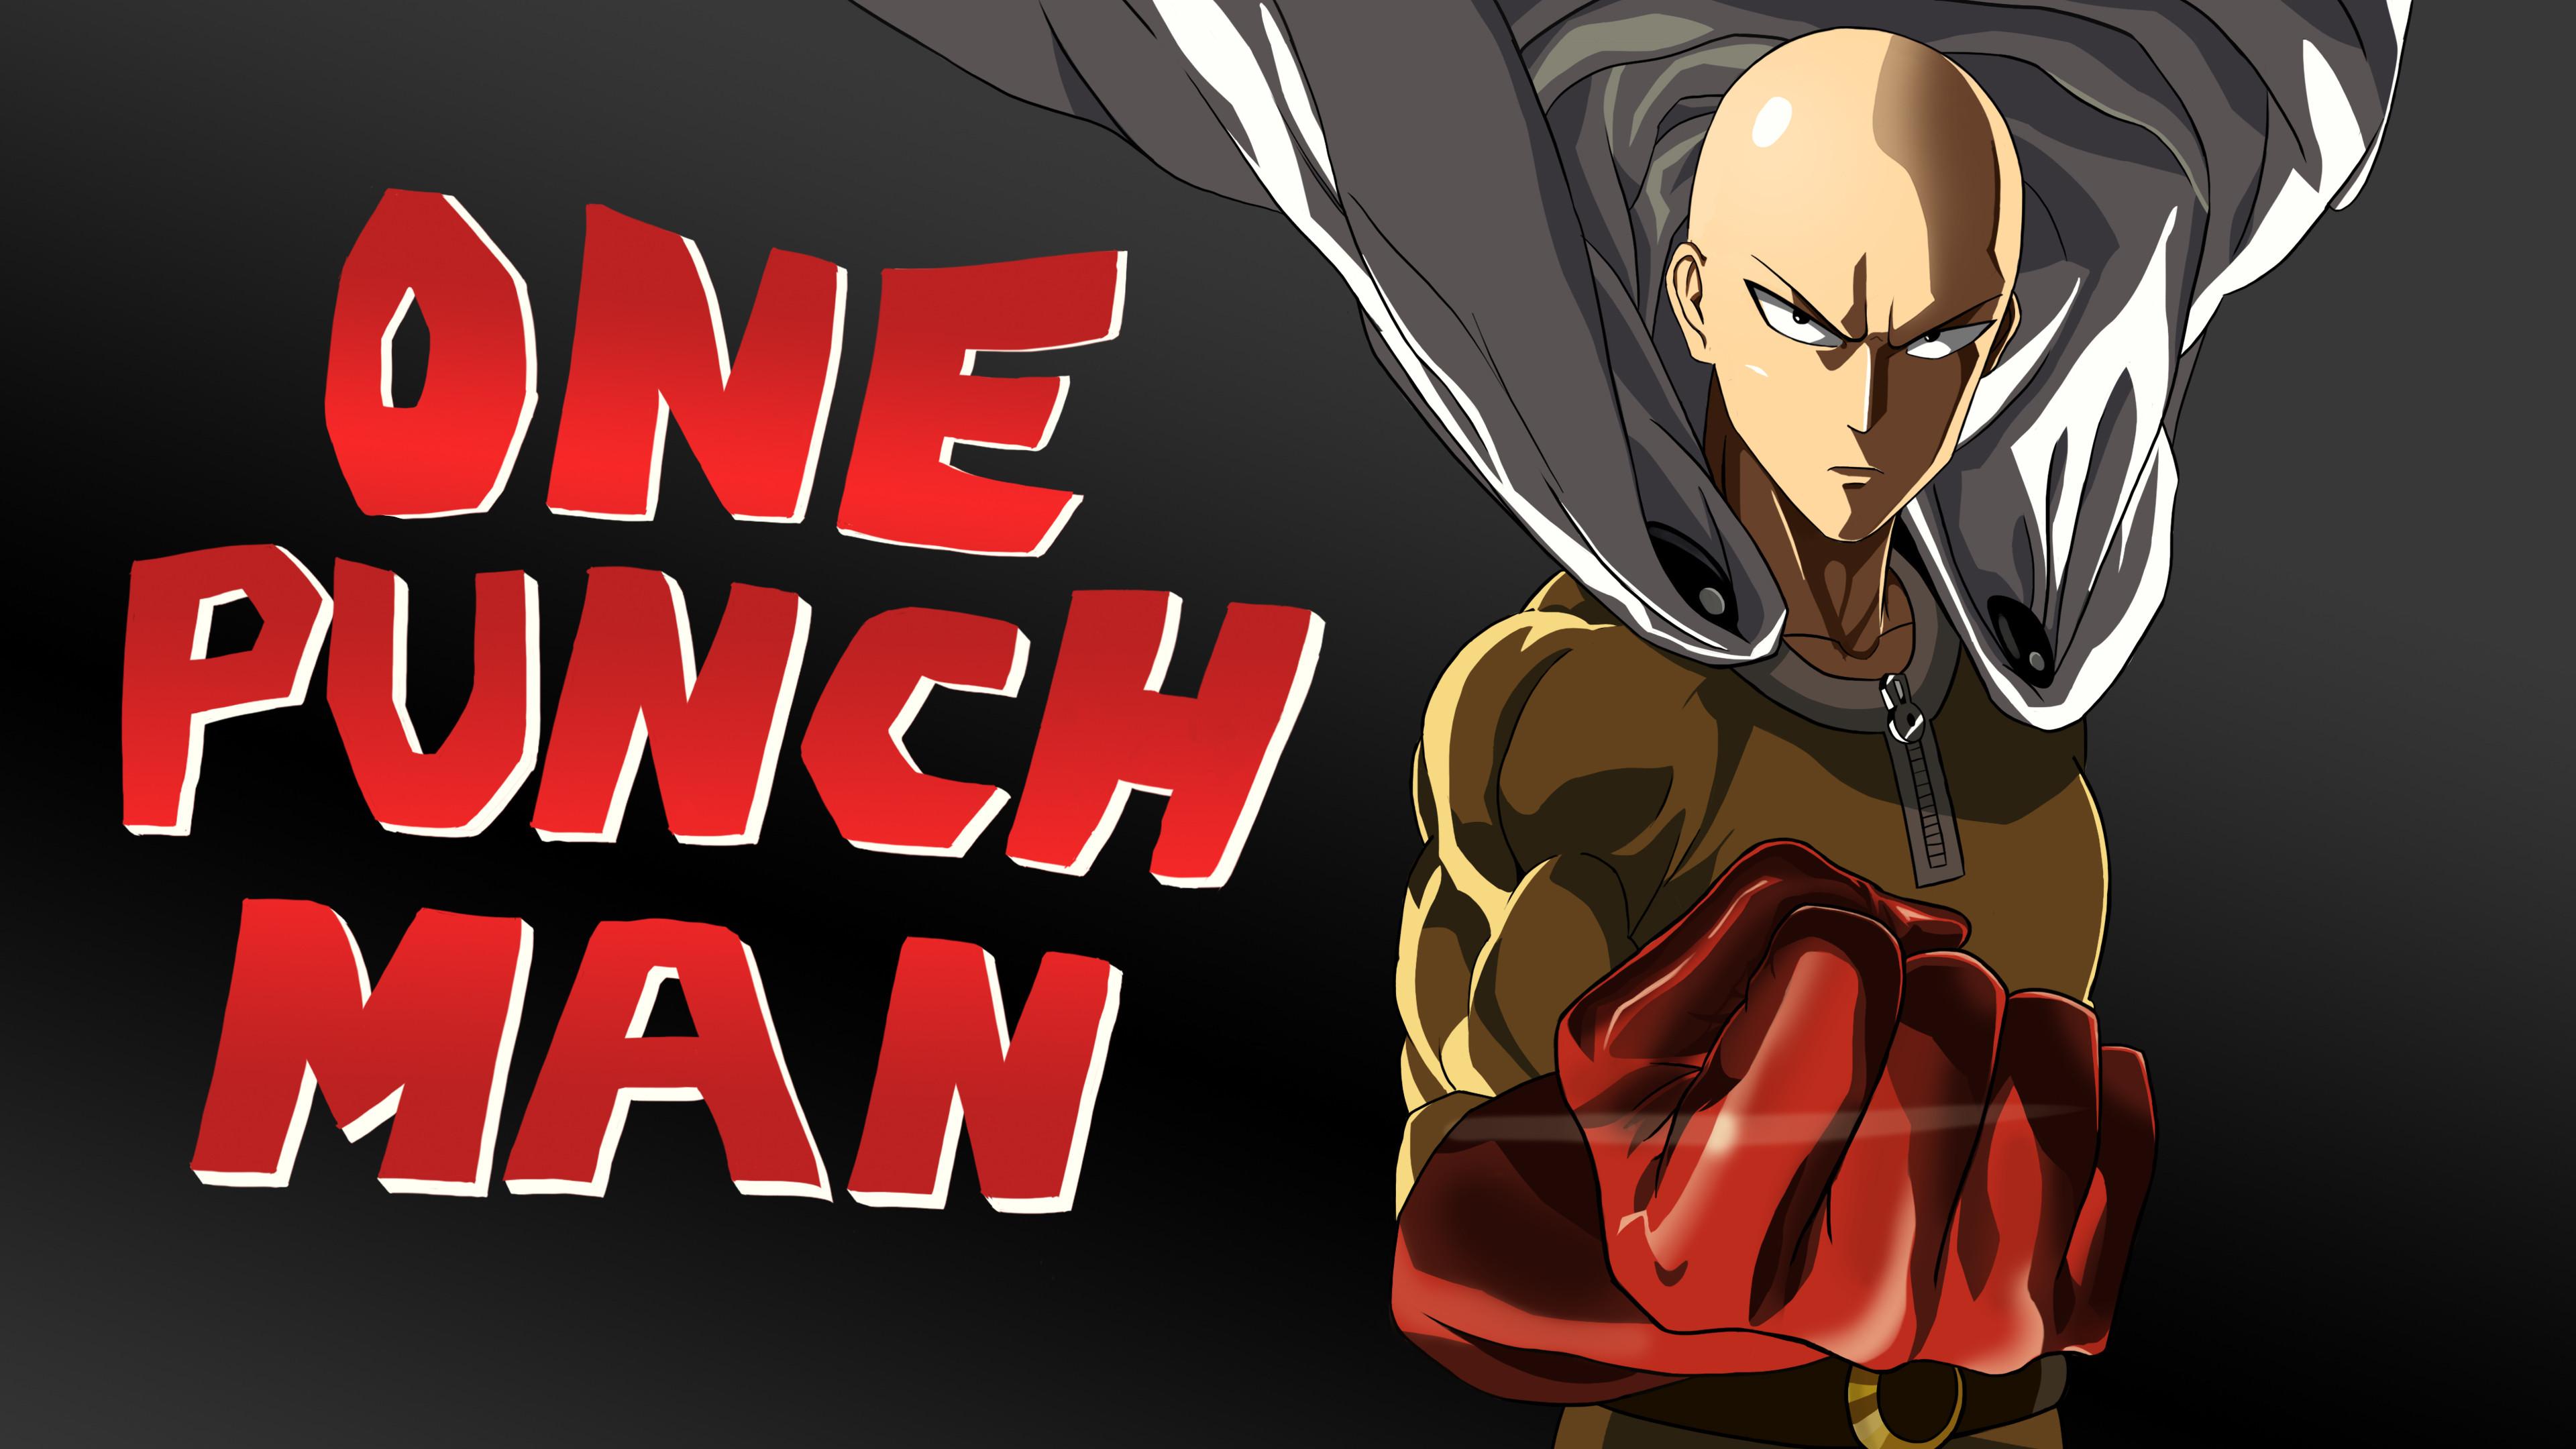 Anime – One-Punch Man Saitama (One-Punch Man) Wallpaper